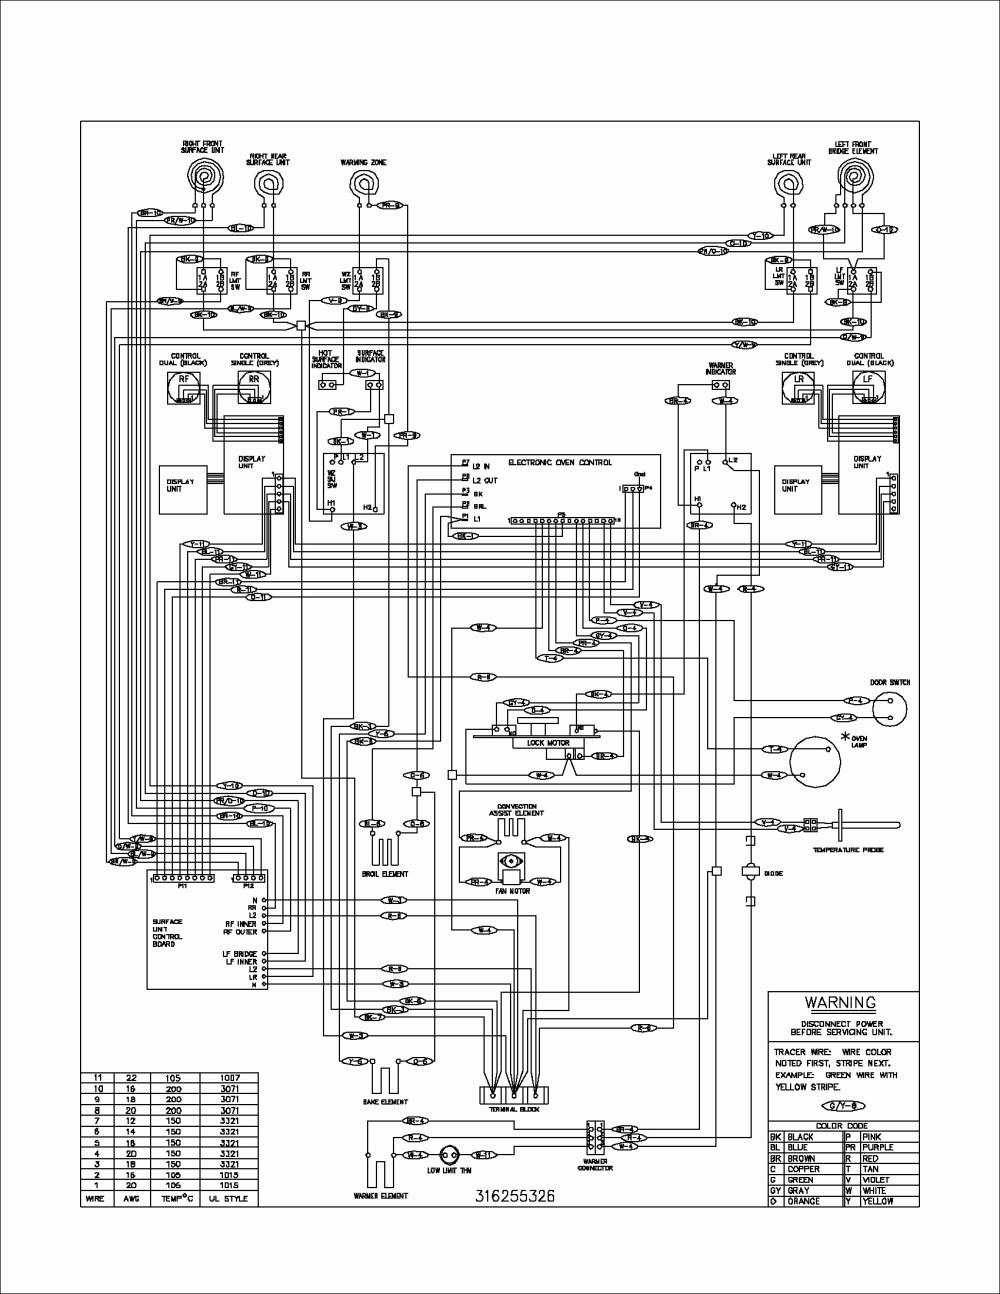 medium resolution of intertherm e2eb 015ha wiring diagram free wiring diagramintertherm e2eb 015ha wiring diagram nordyne e2eb 015ha wiring